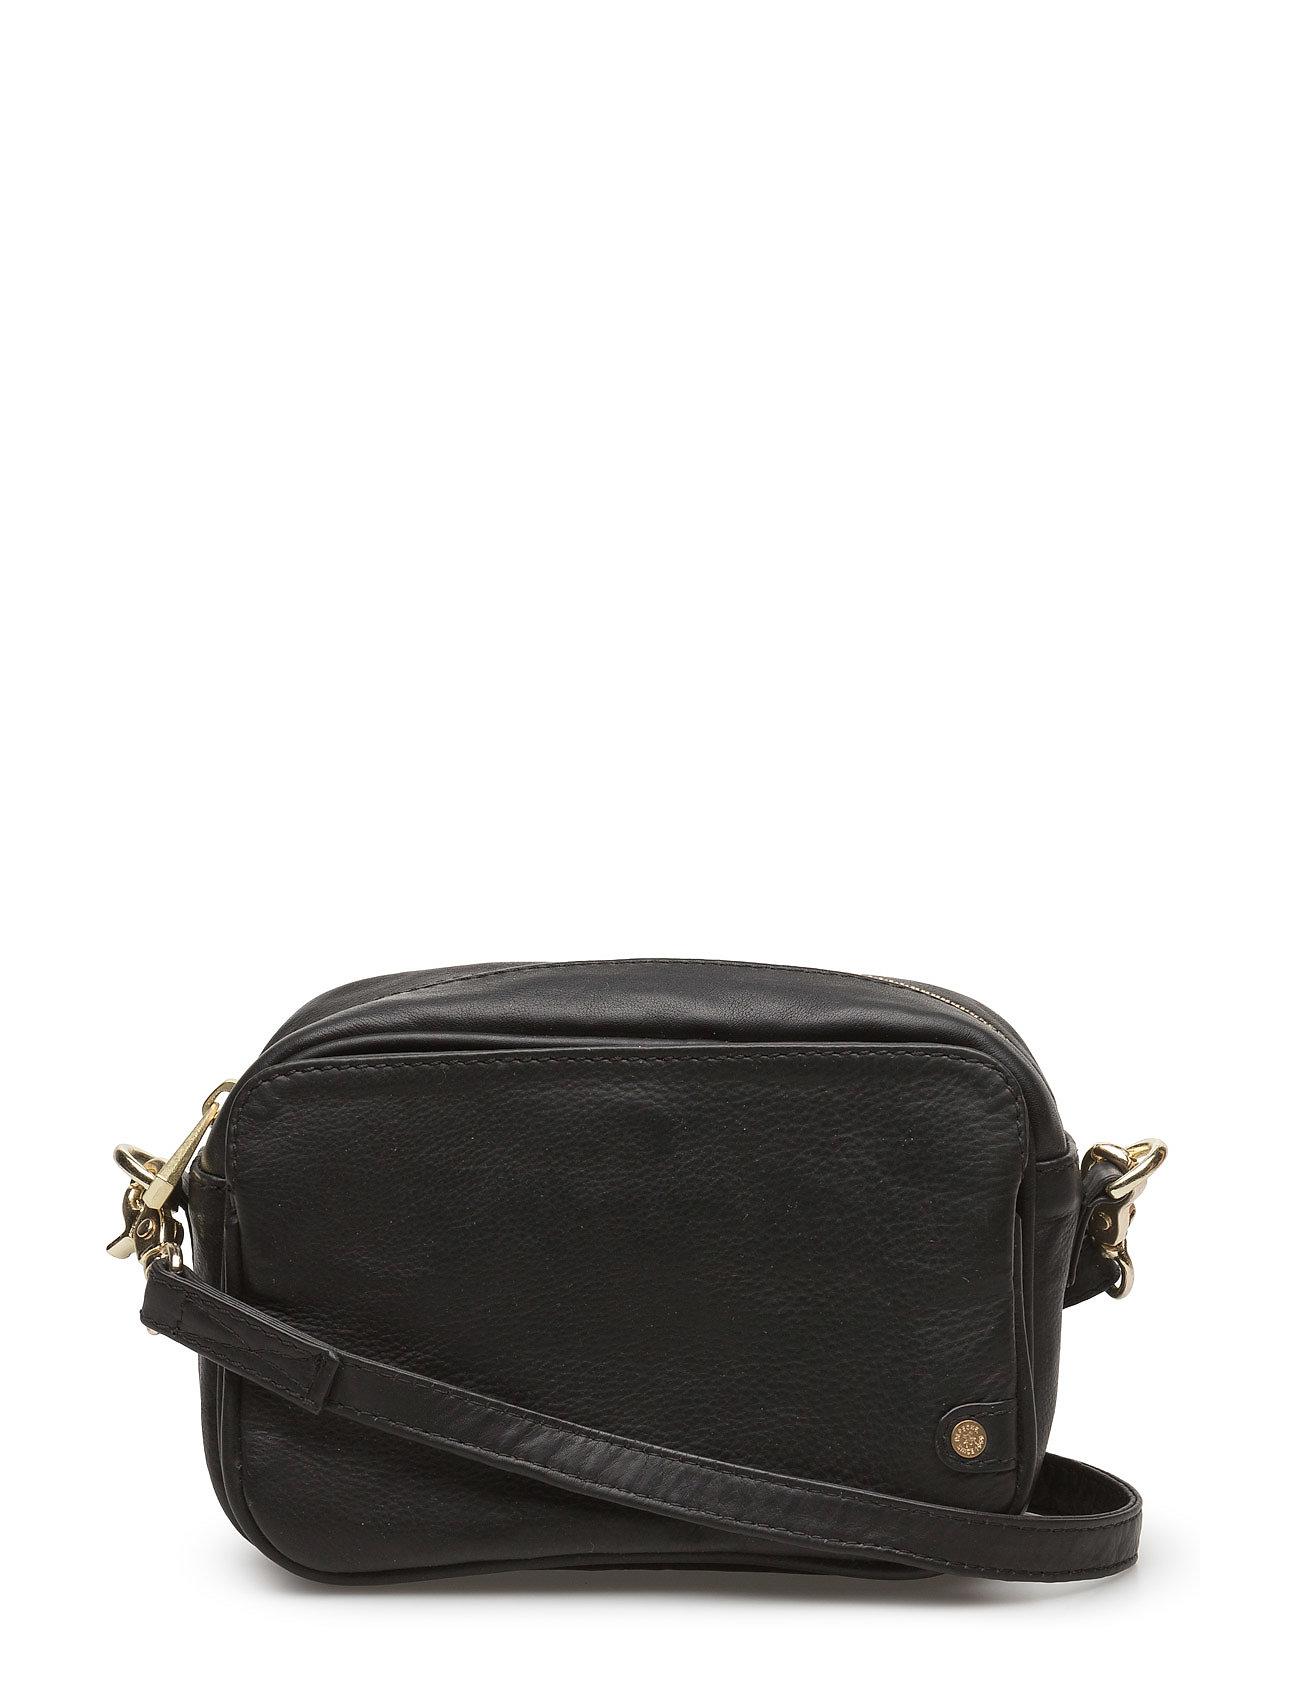 1124f905cf0d Small Bag   Clutch DEPECHE Små tasker til Damer i Sort ...